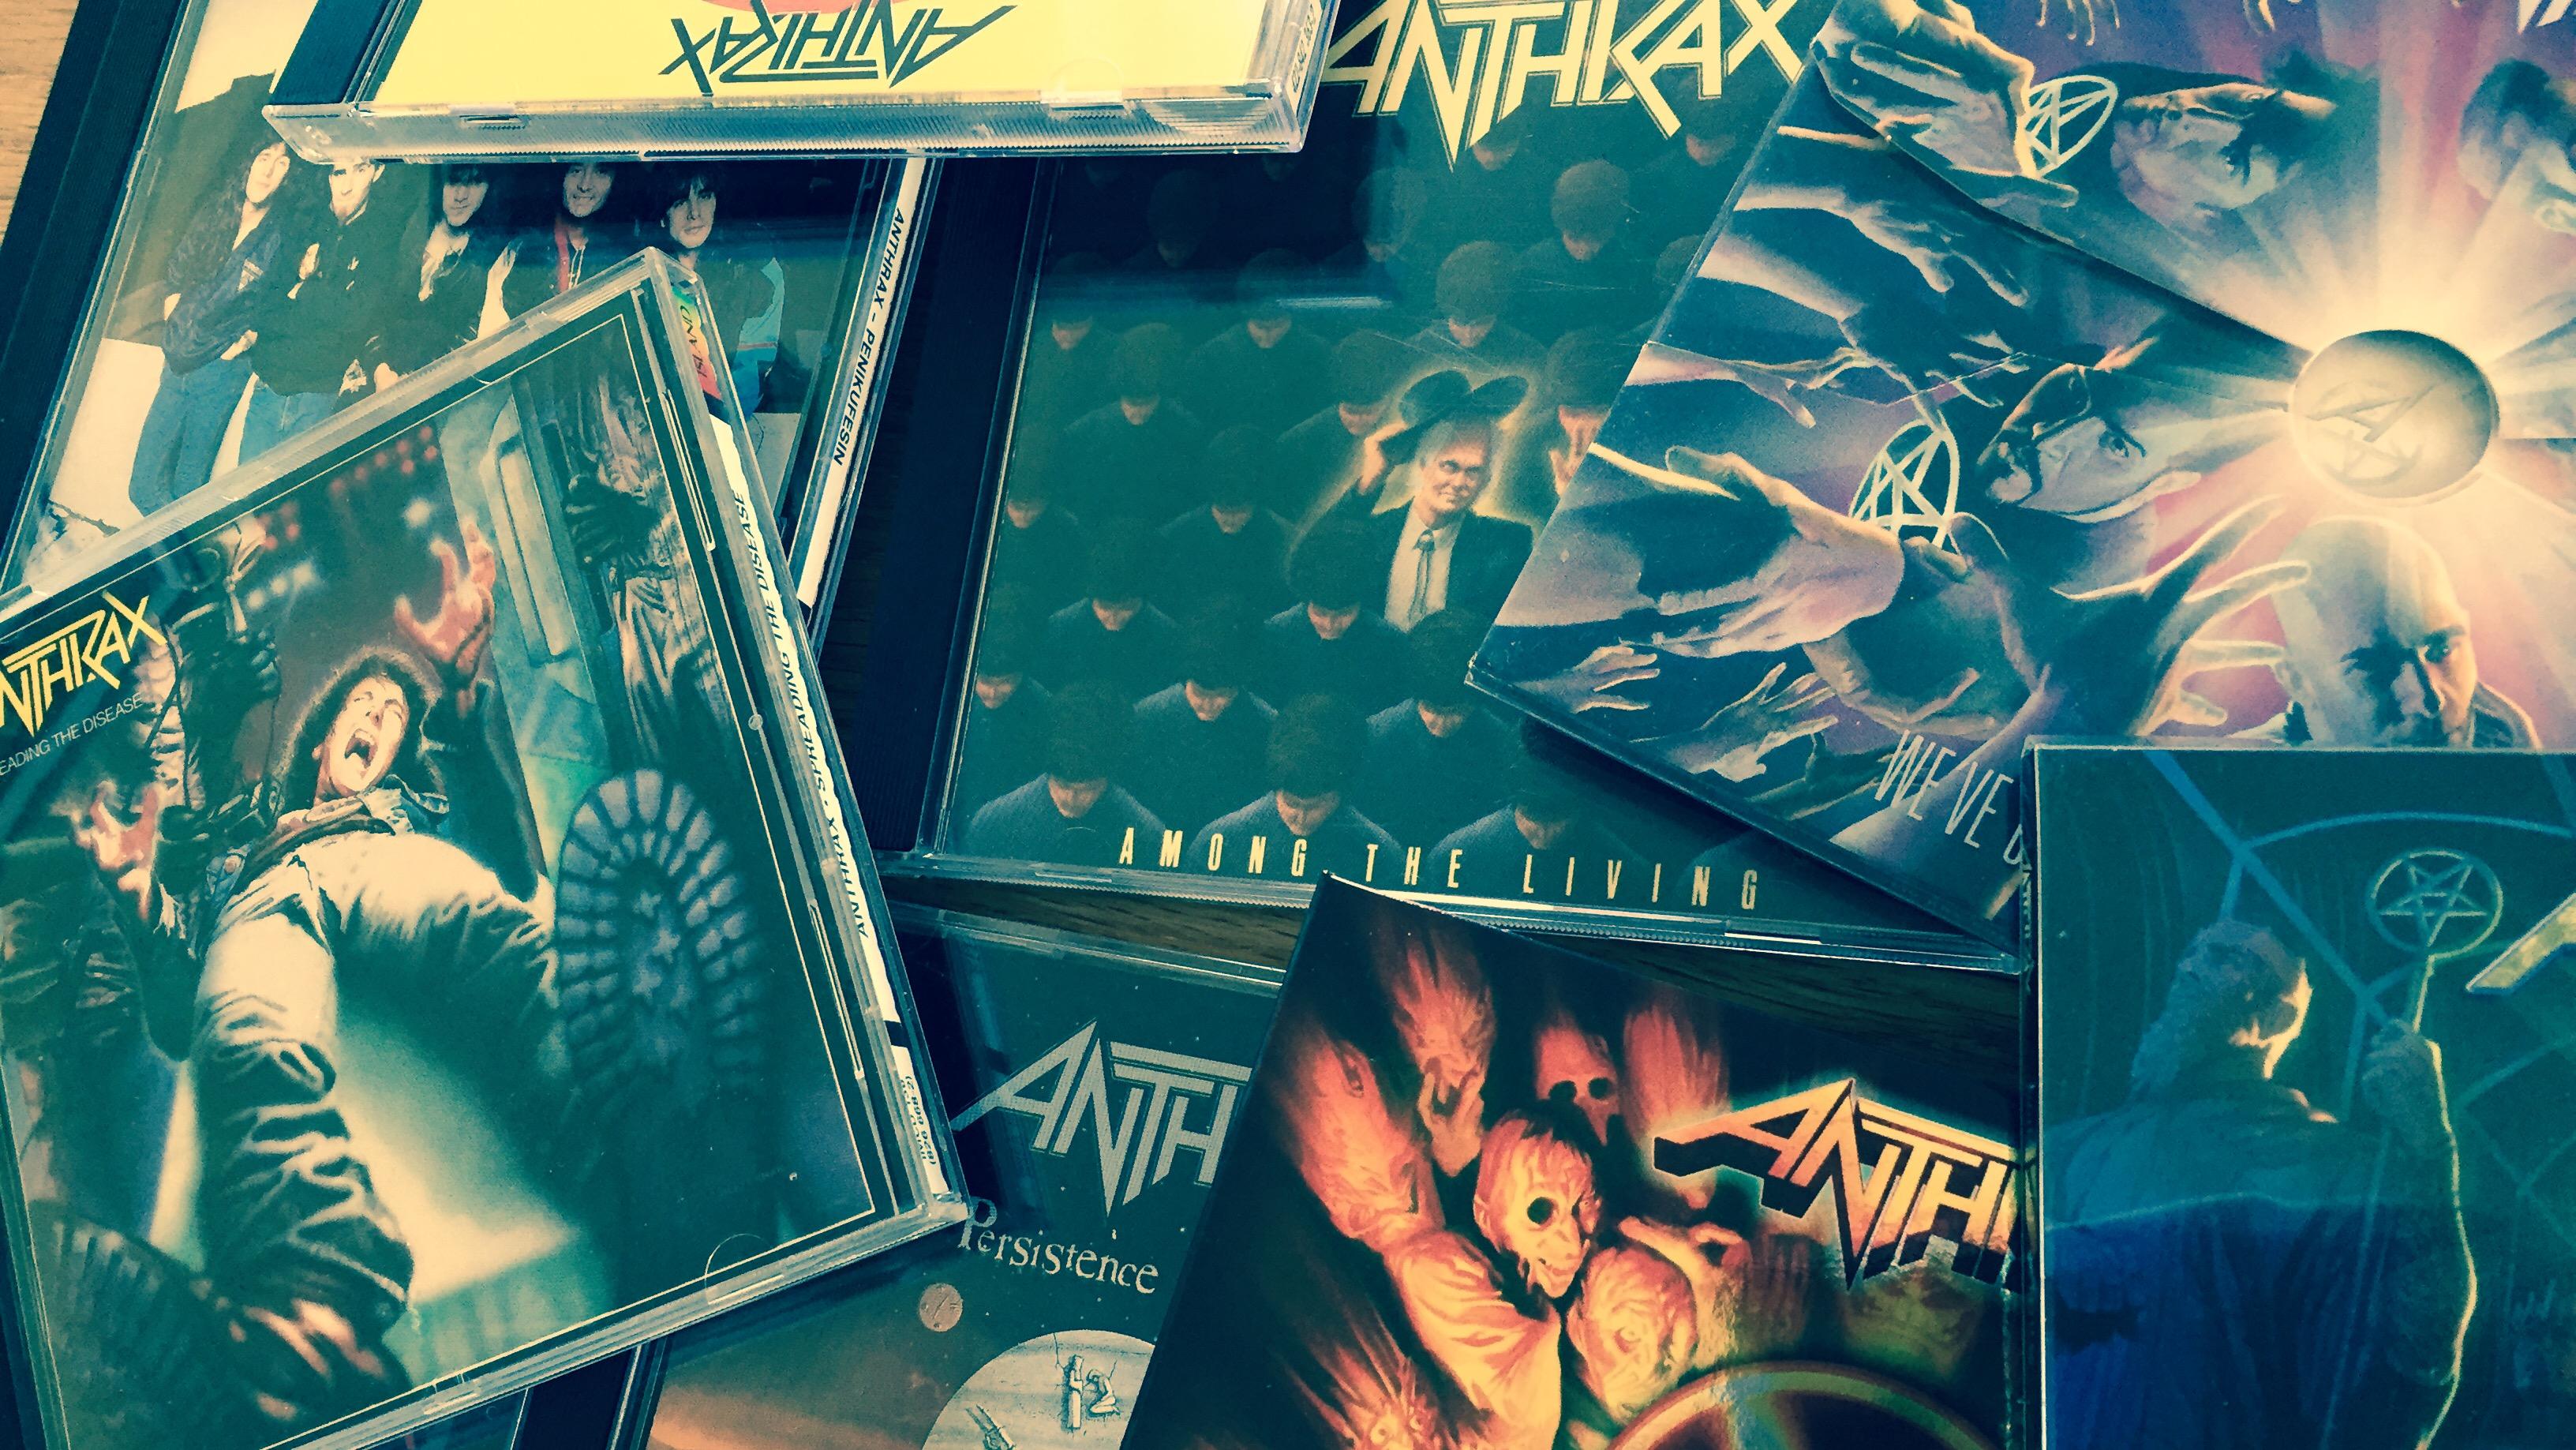 Anthrax Studio Albums Ranked «Worst To Best» – Albums That Rock